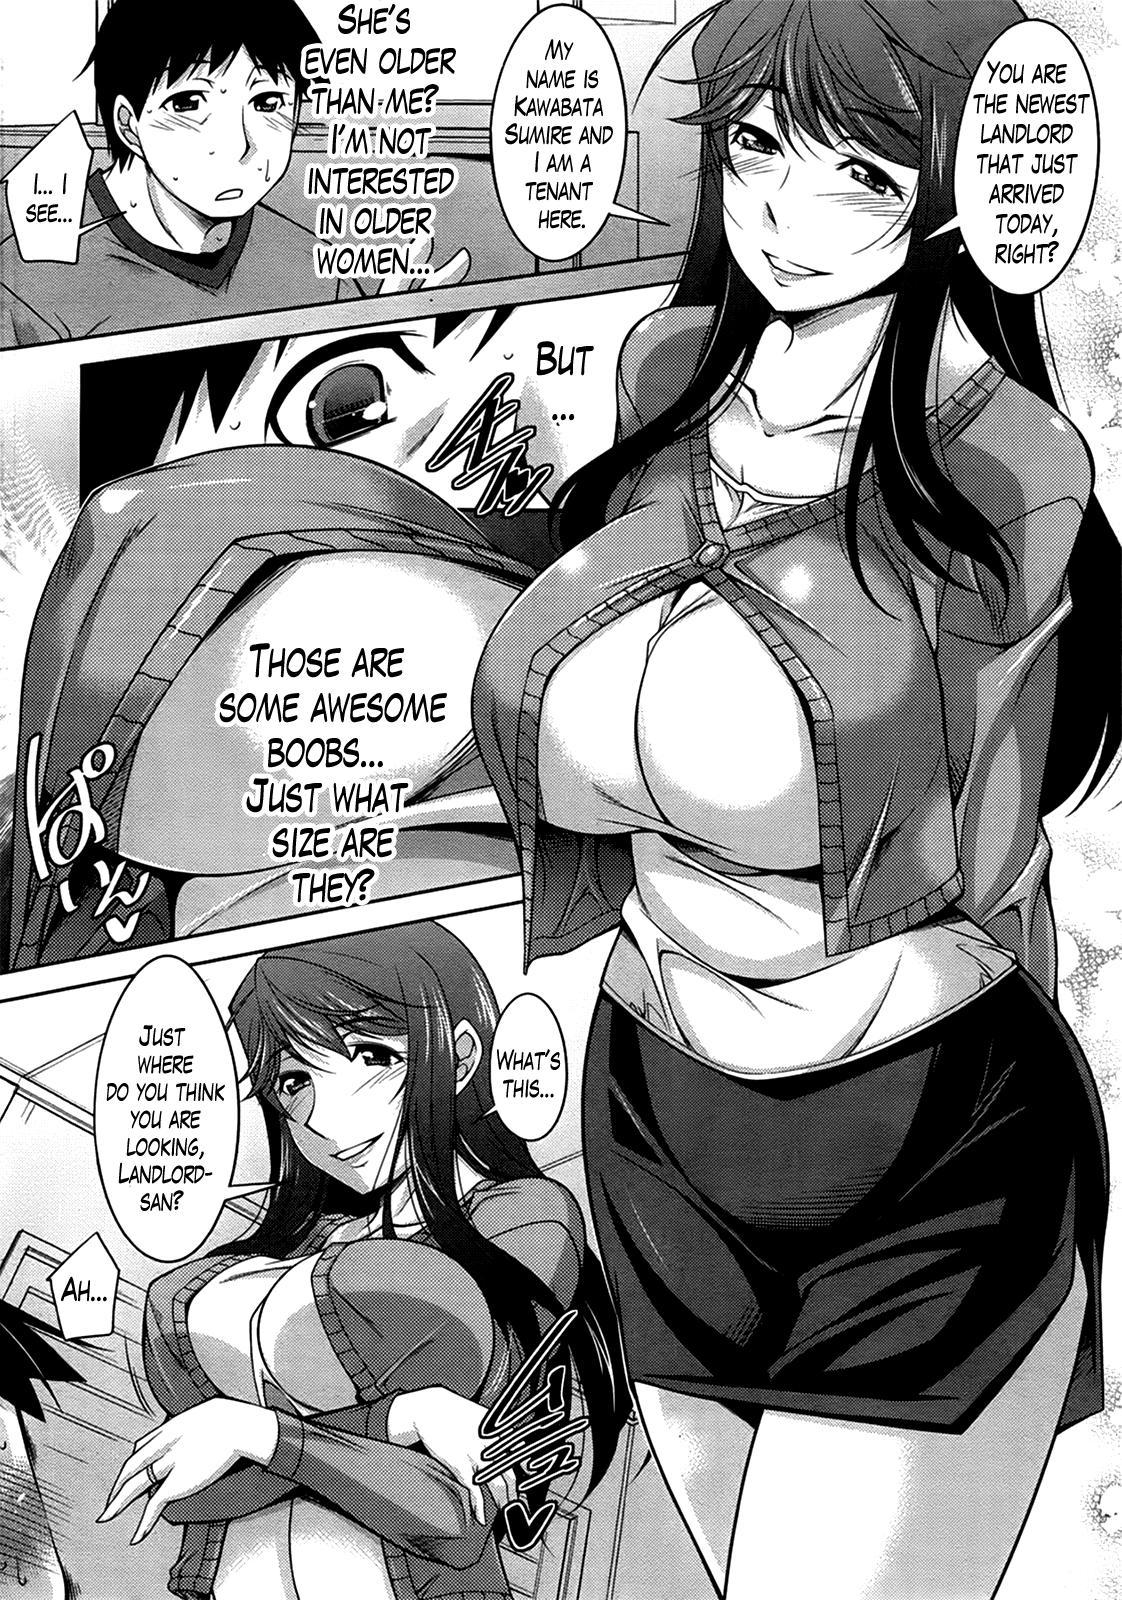 [Zen9] Taikutsu na Gogo no Sugoshikata Ch. 1-4   A Way to Spend a Boring Afternoon Ch. 1-4 (Action Pizazz DX 2013-12) [English](hentai2read.com)[Lazarus H] 8